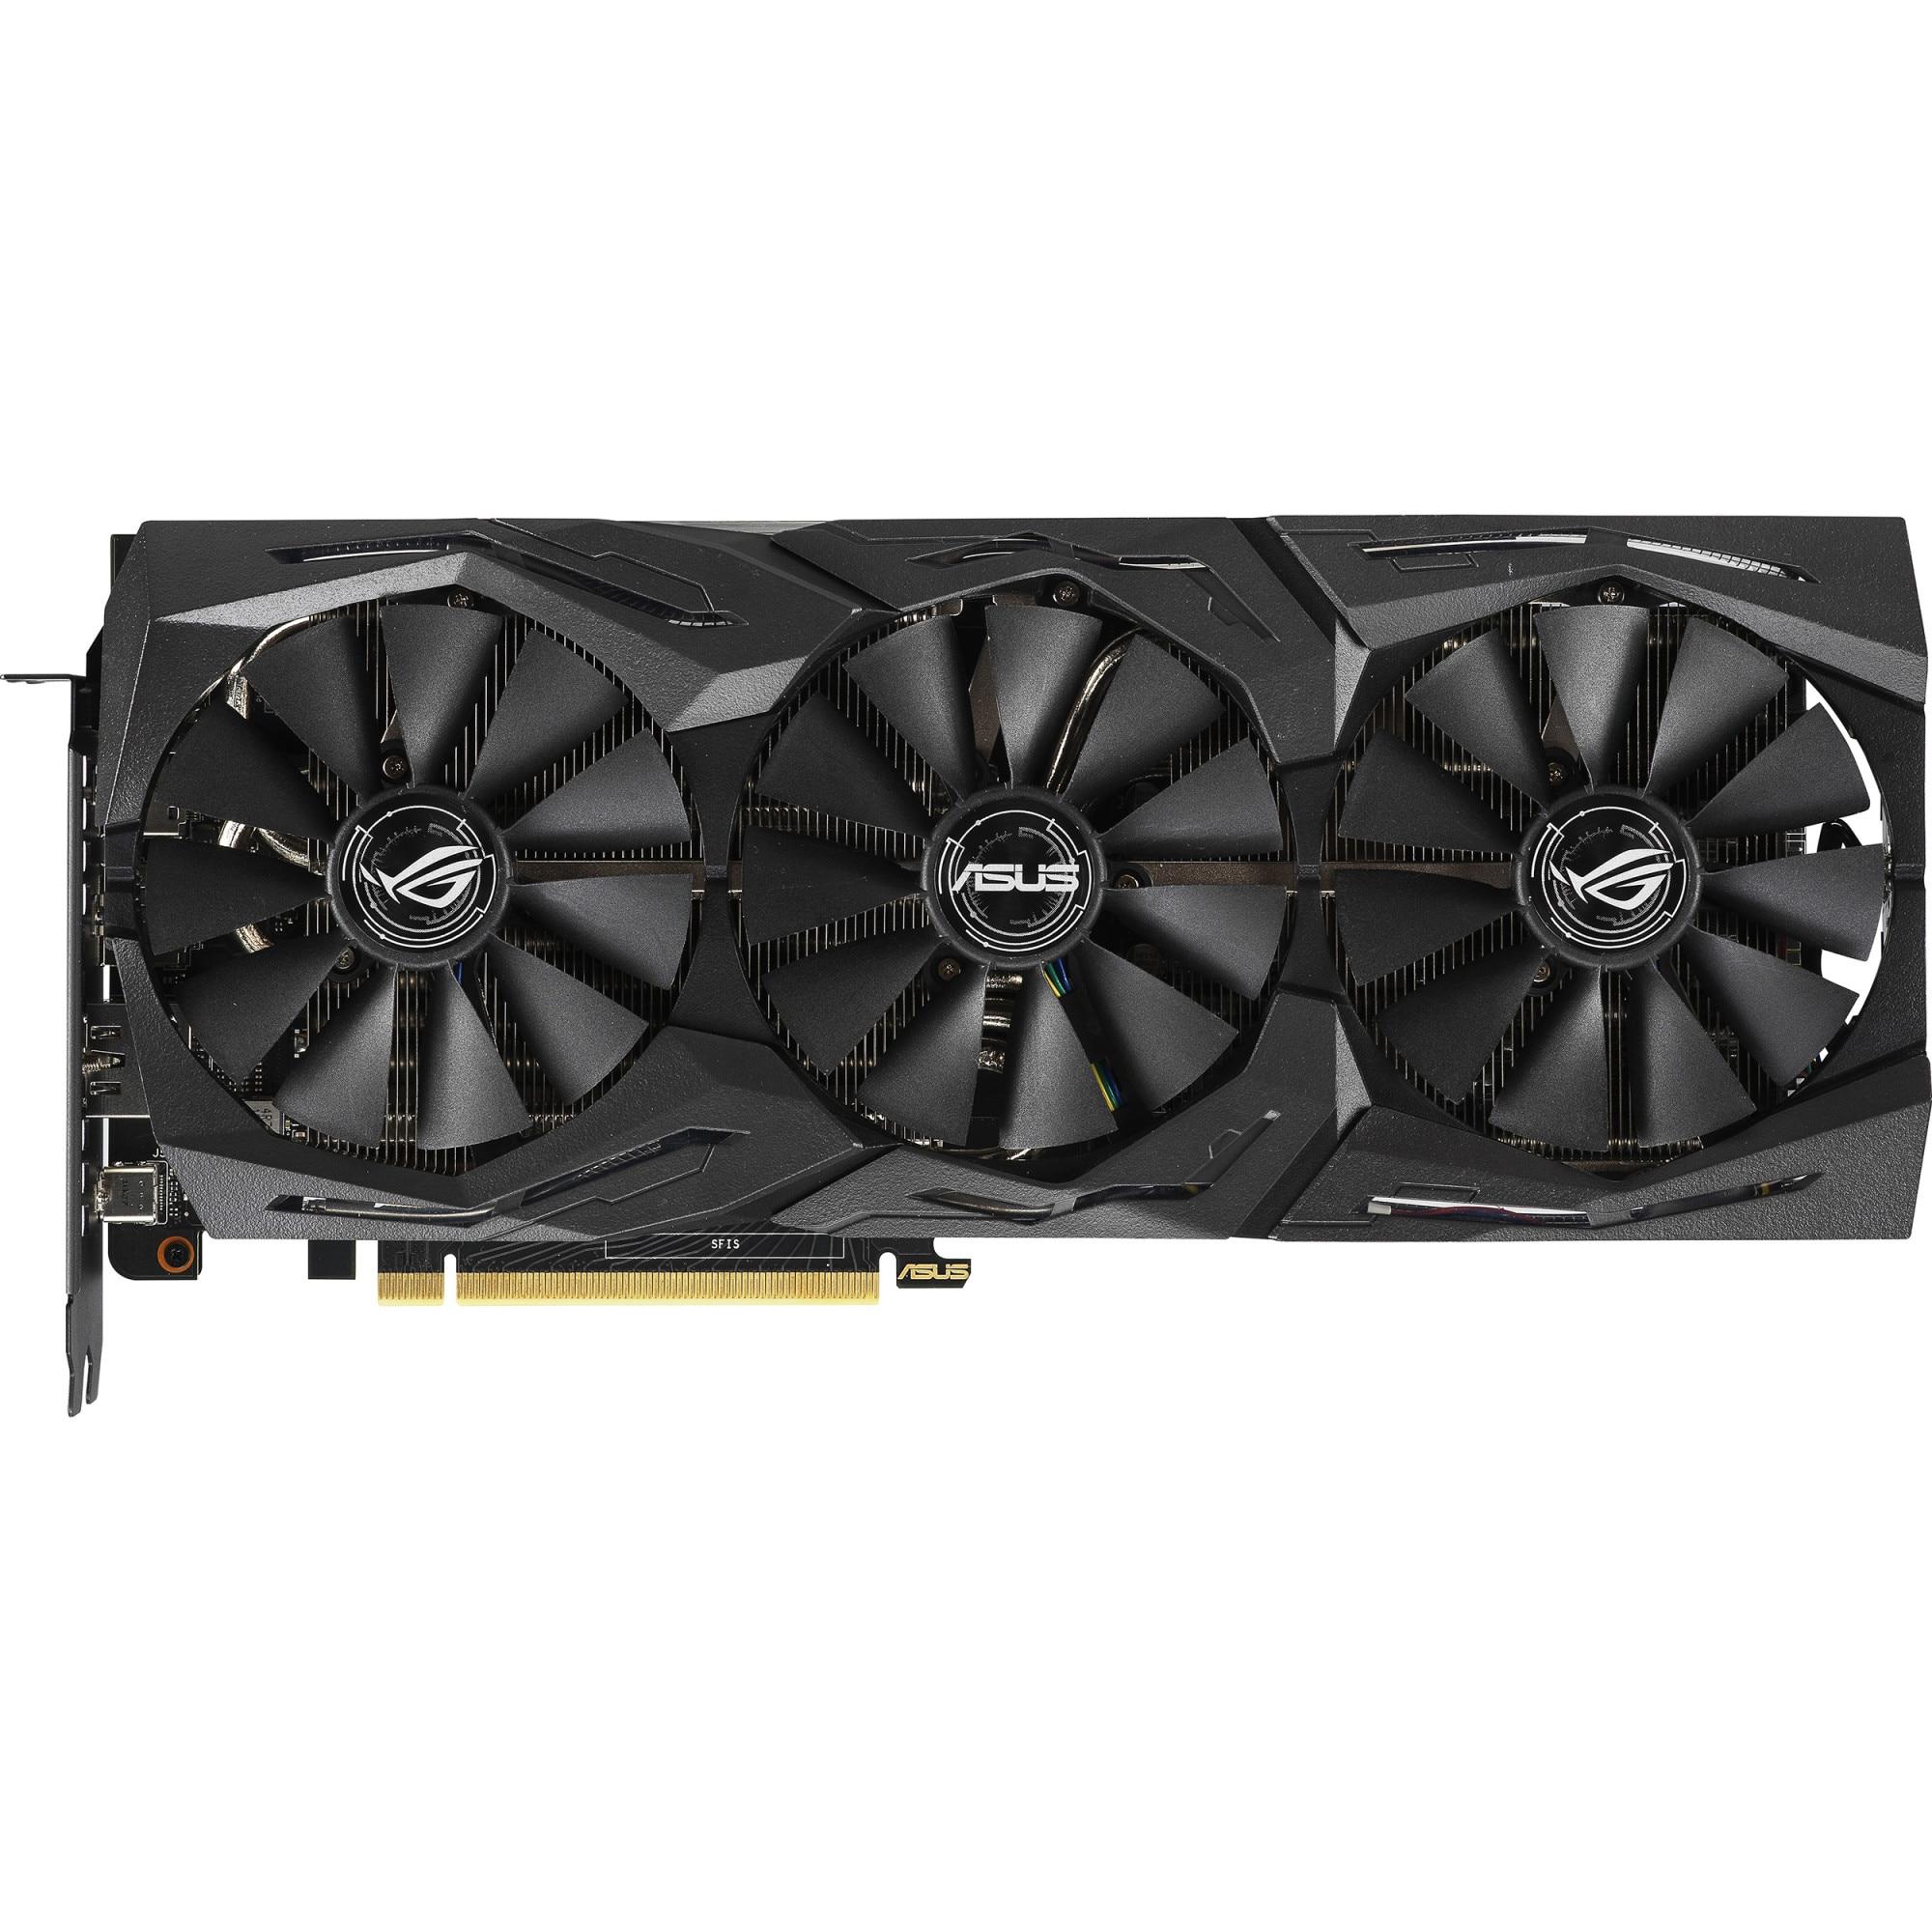 Fotografie Placa video Asus ROG STRIX GeForce® RTX™ 2070 Super Gaming OC, 8GB GDDR6, 256-bit